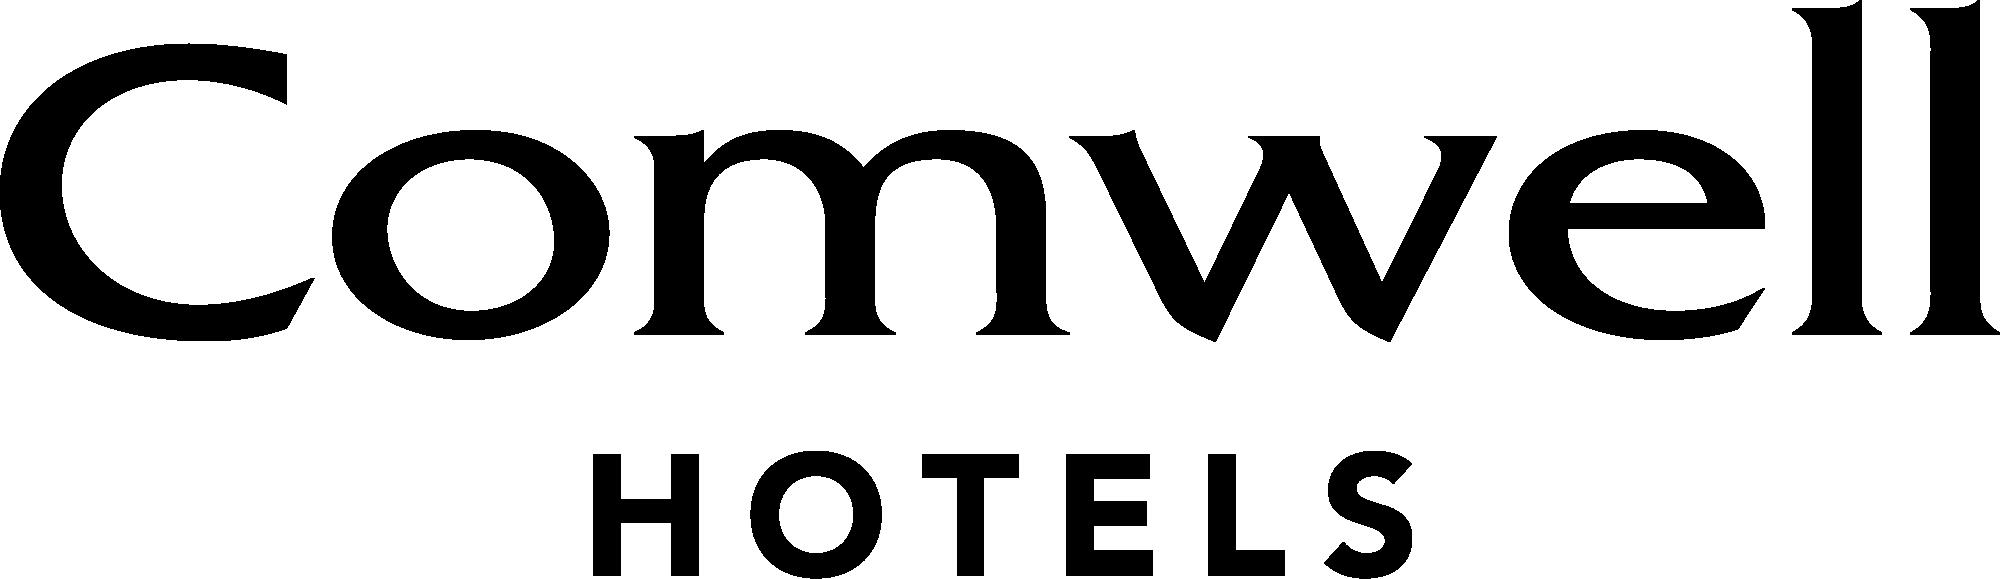 HOTELS_logo